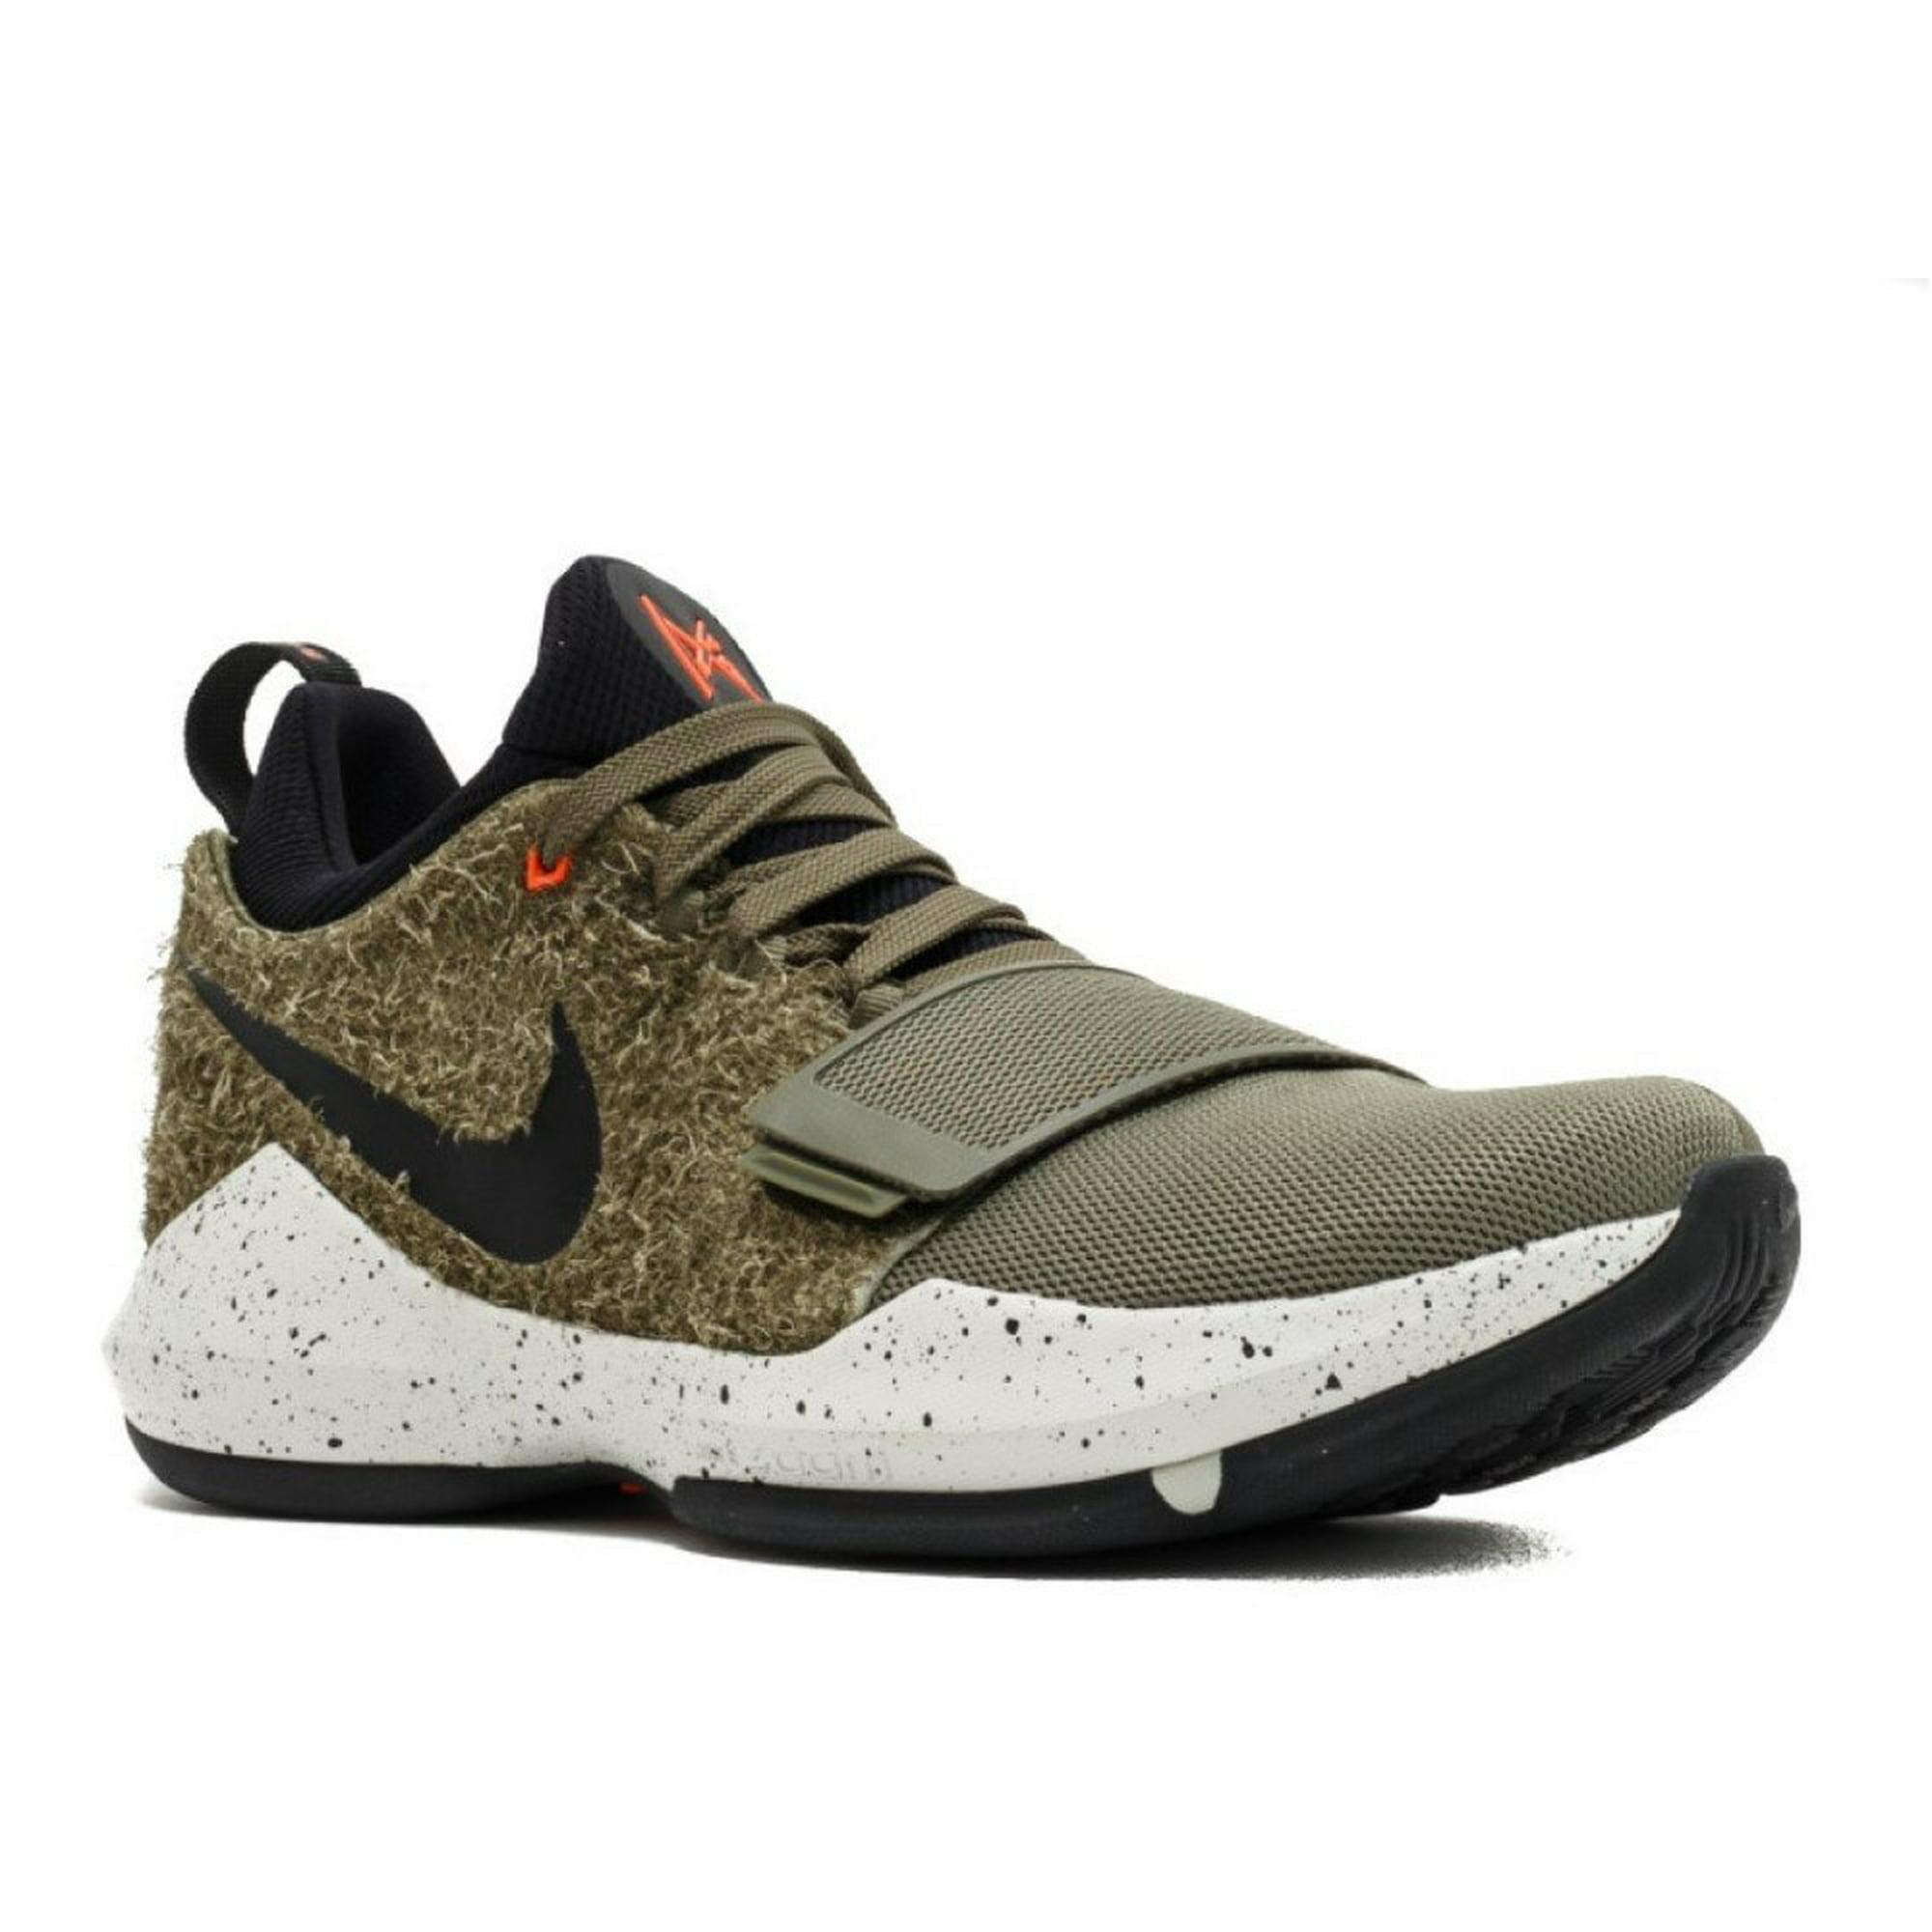 4ee8178e1244 Nike - Men - Pg 1 Elements - 911085-200 - Size 10